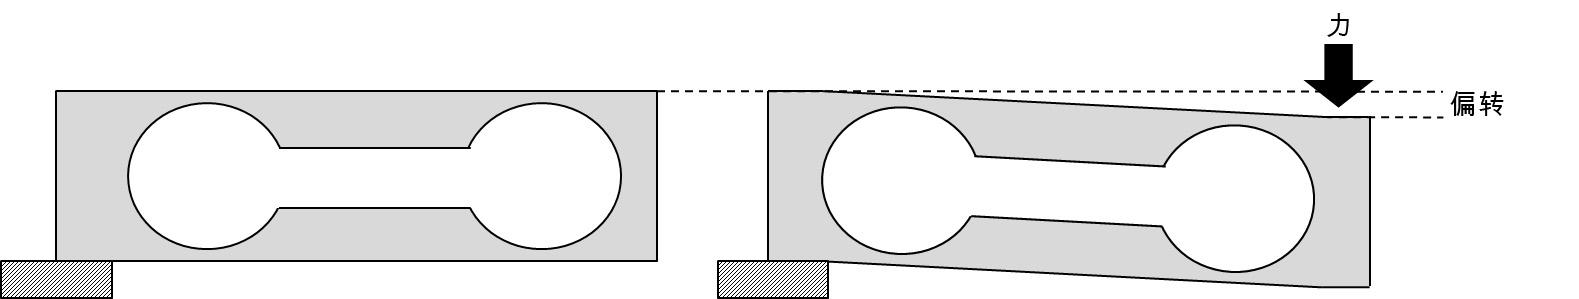 AutoCal_Image_CN-(2).jpg